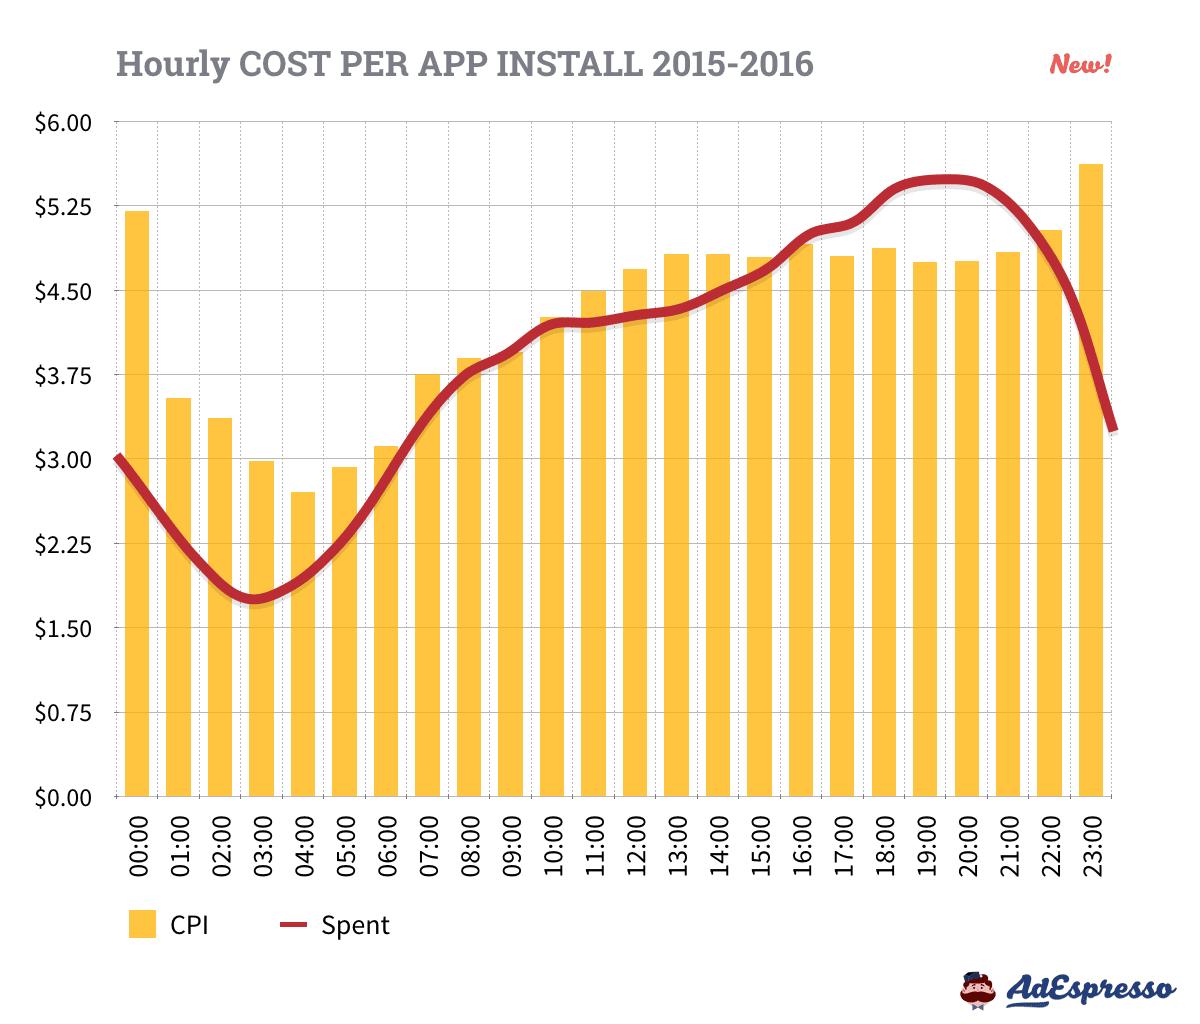 Facebook Advertising Cost Per App Install - Hourly Breakdown